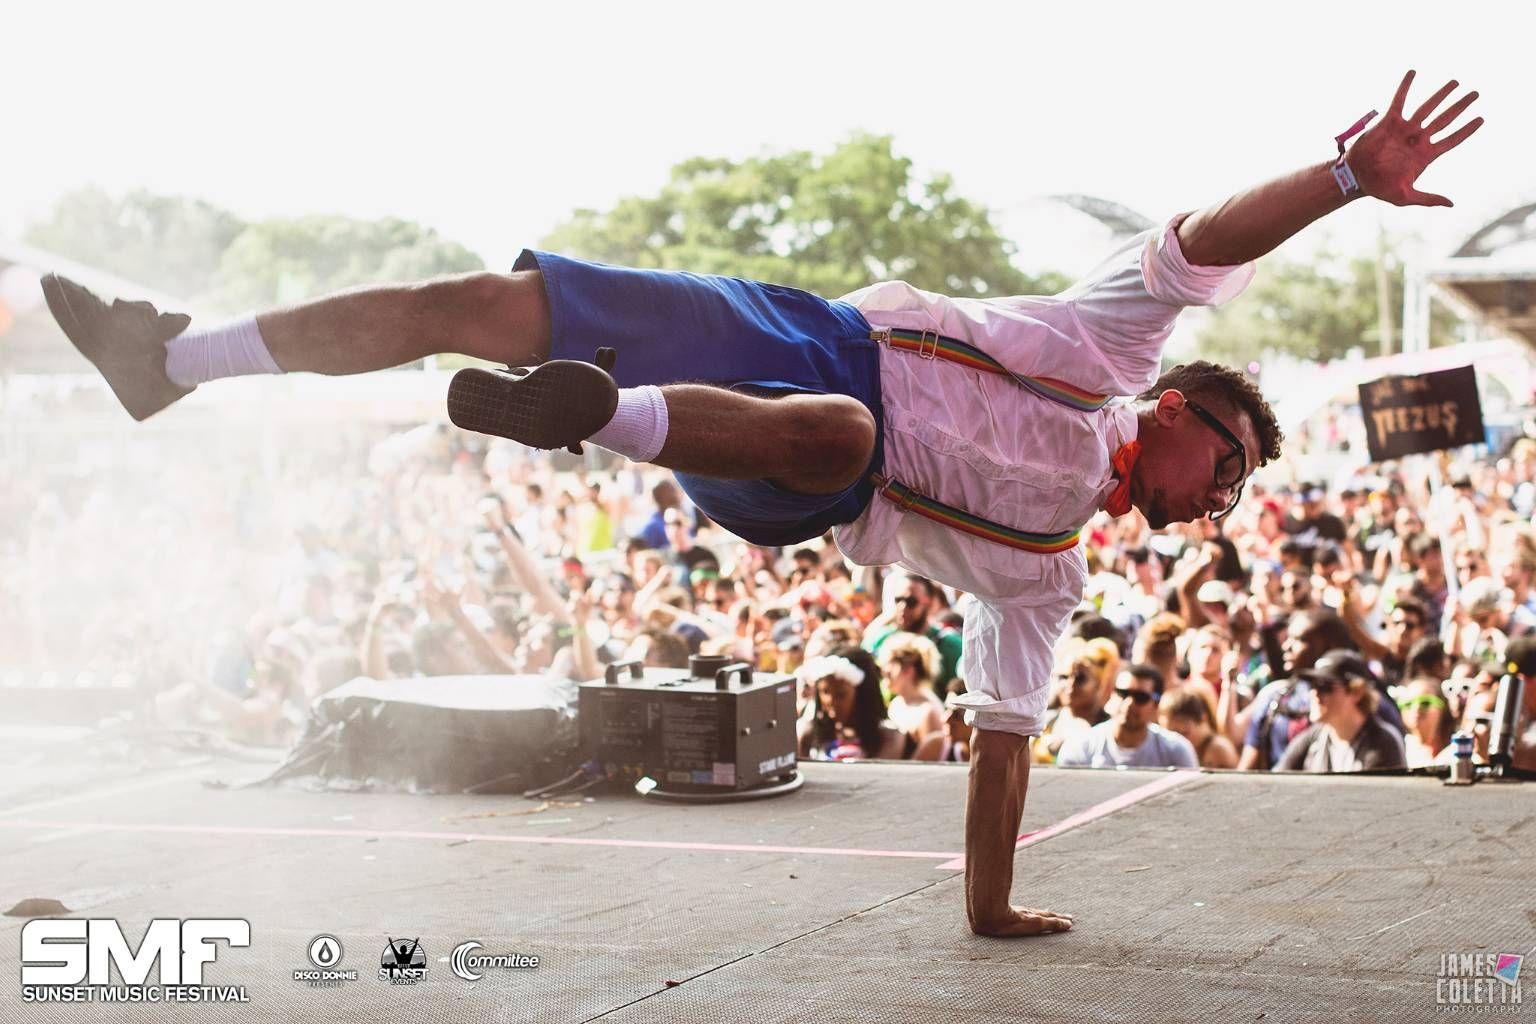 Sunset Music Festival Image